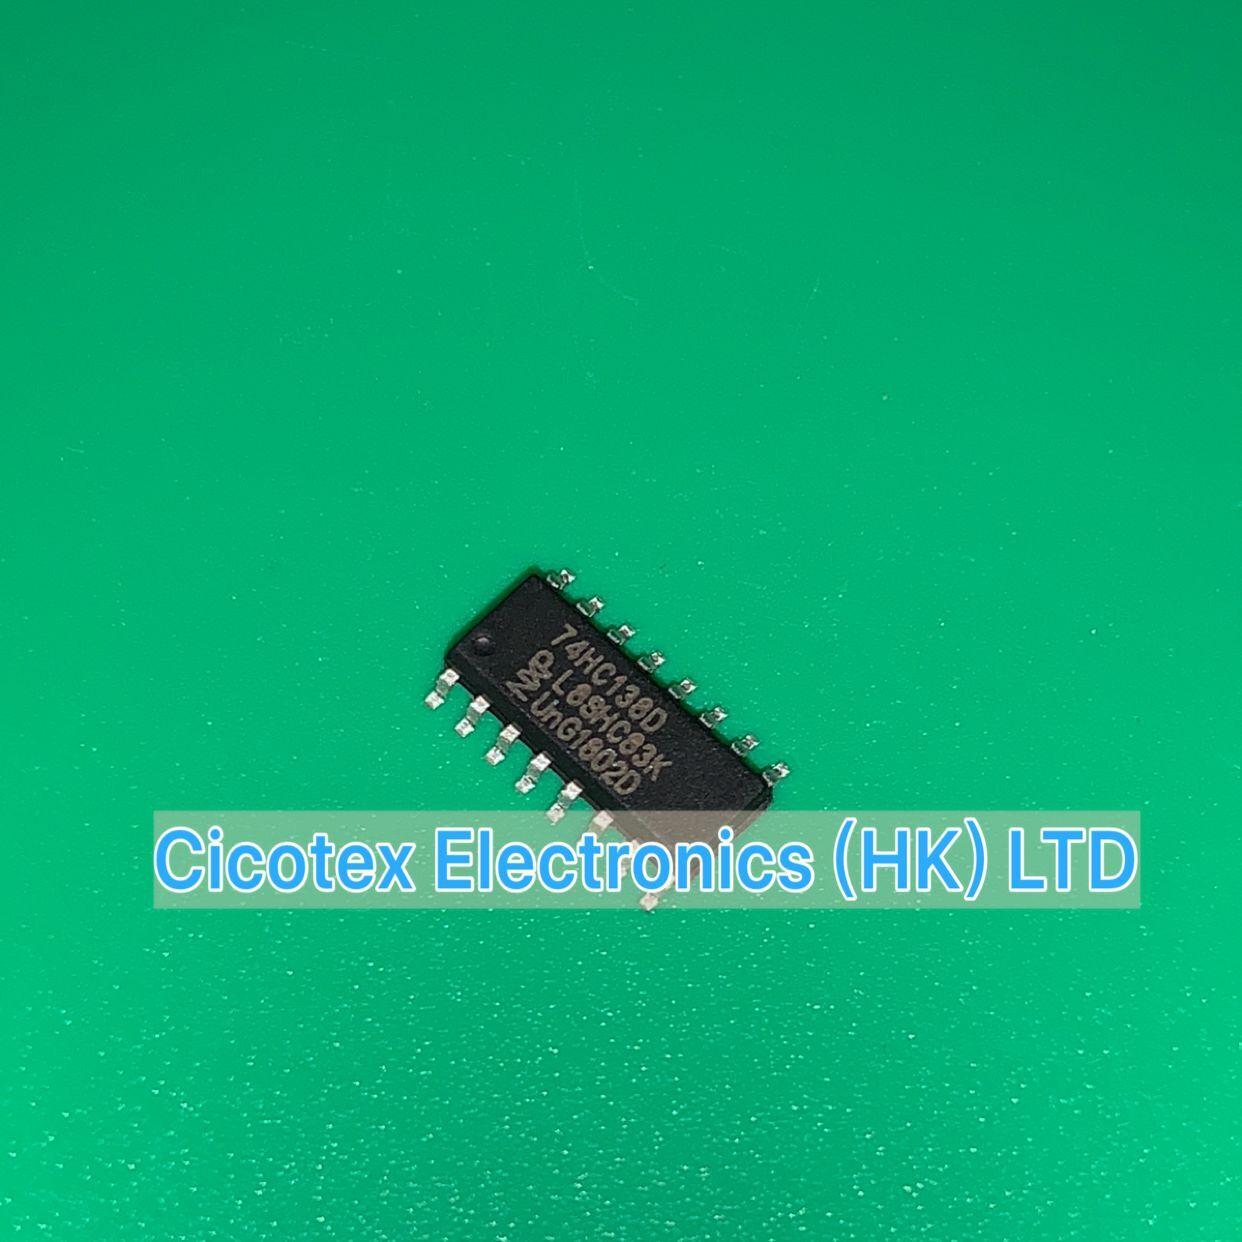 10 pçs/lote 74HC138D SOP16 74 HC138 D IC DECODER/DEMUX 3-LINHA 8 16 SN74HC138DR 8SOIC